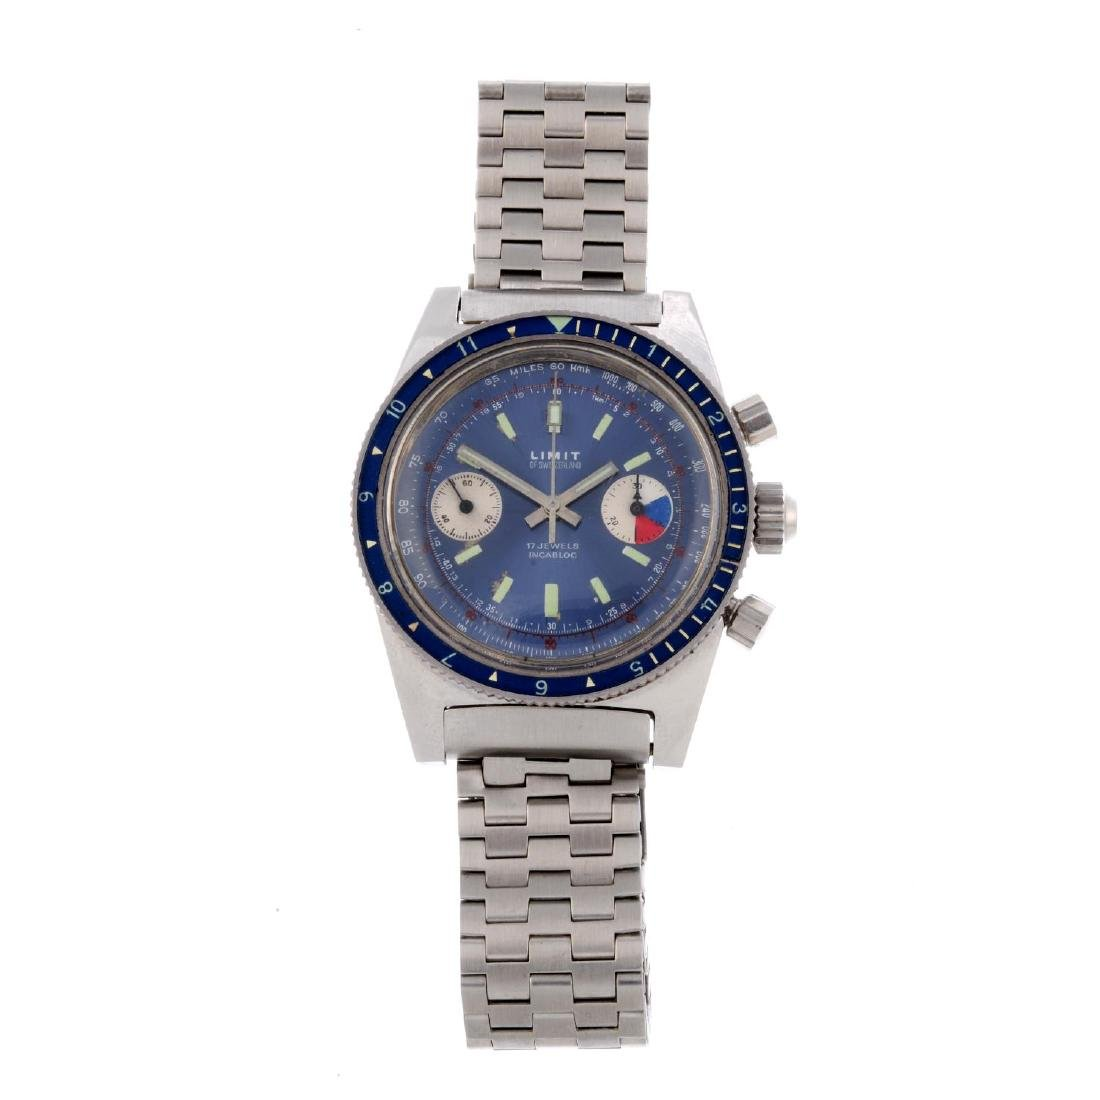 LIMIT - a gentleman's chronograph bracelet watch.